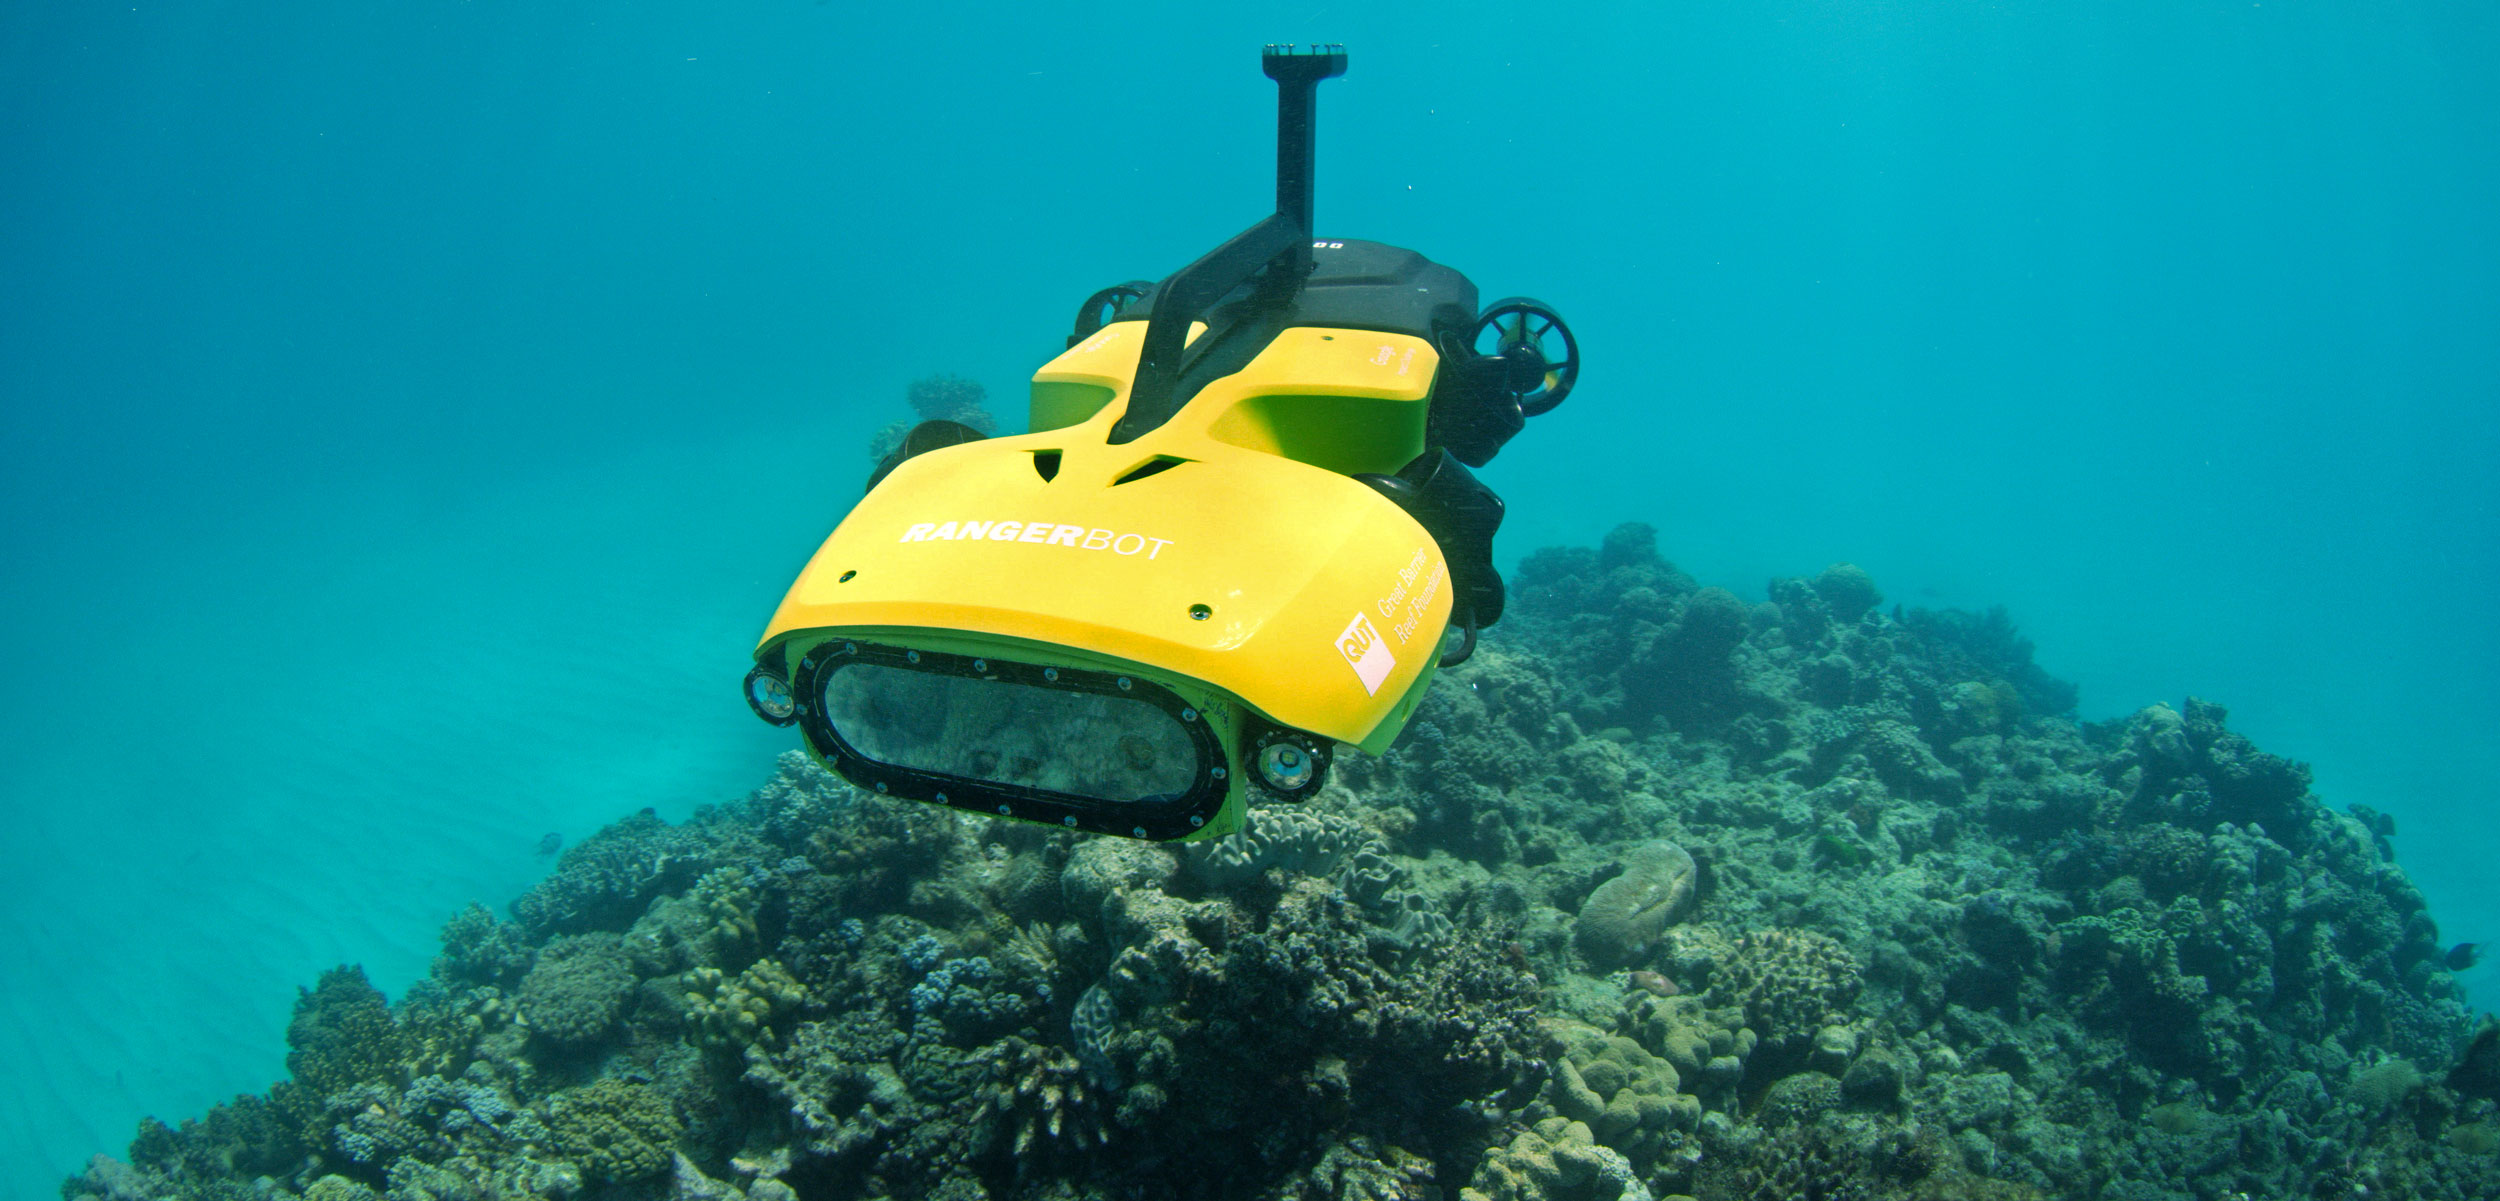 RangerBot underwater